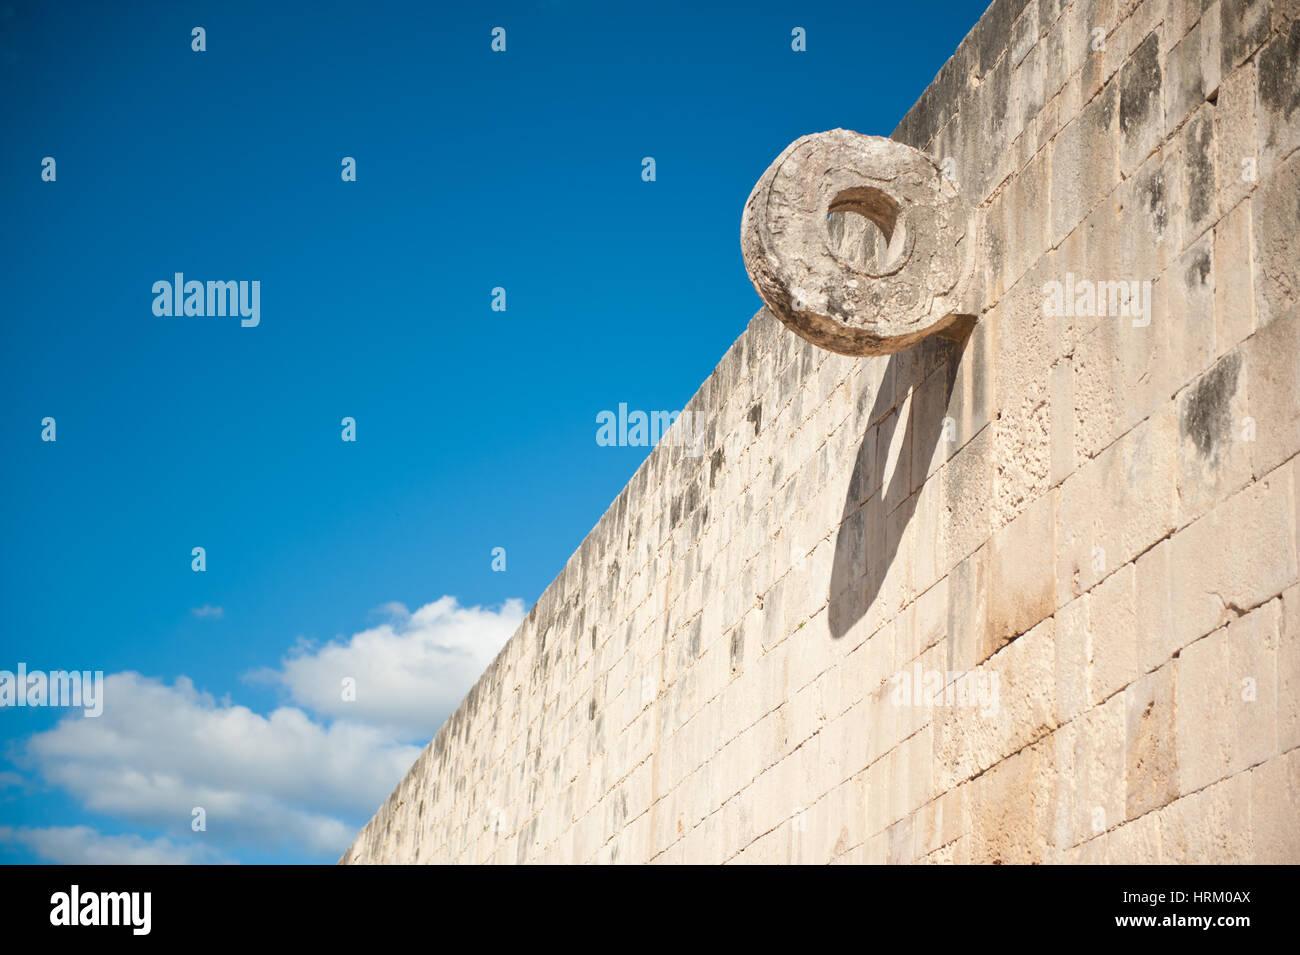 Wall on Mayan football field at Chichen Itza, Yucatan, Mexico. - Stock Image